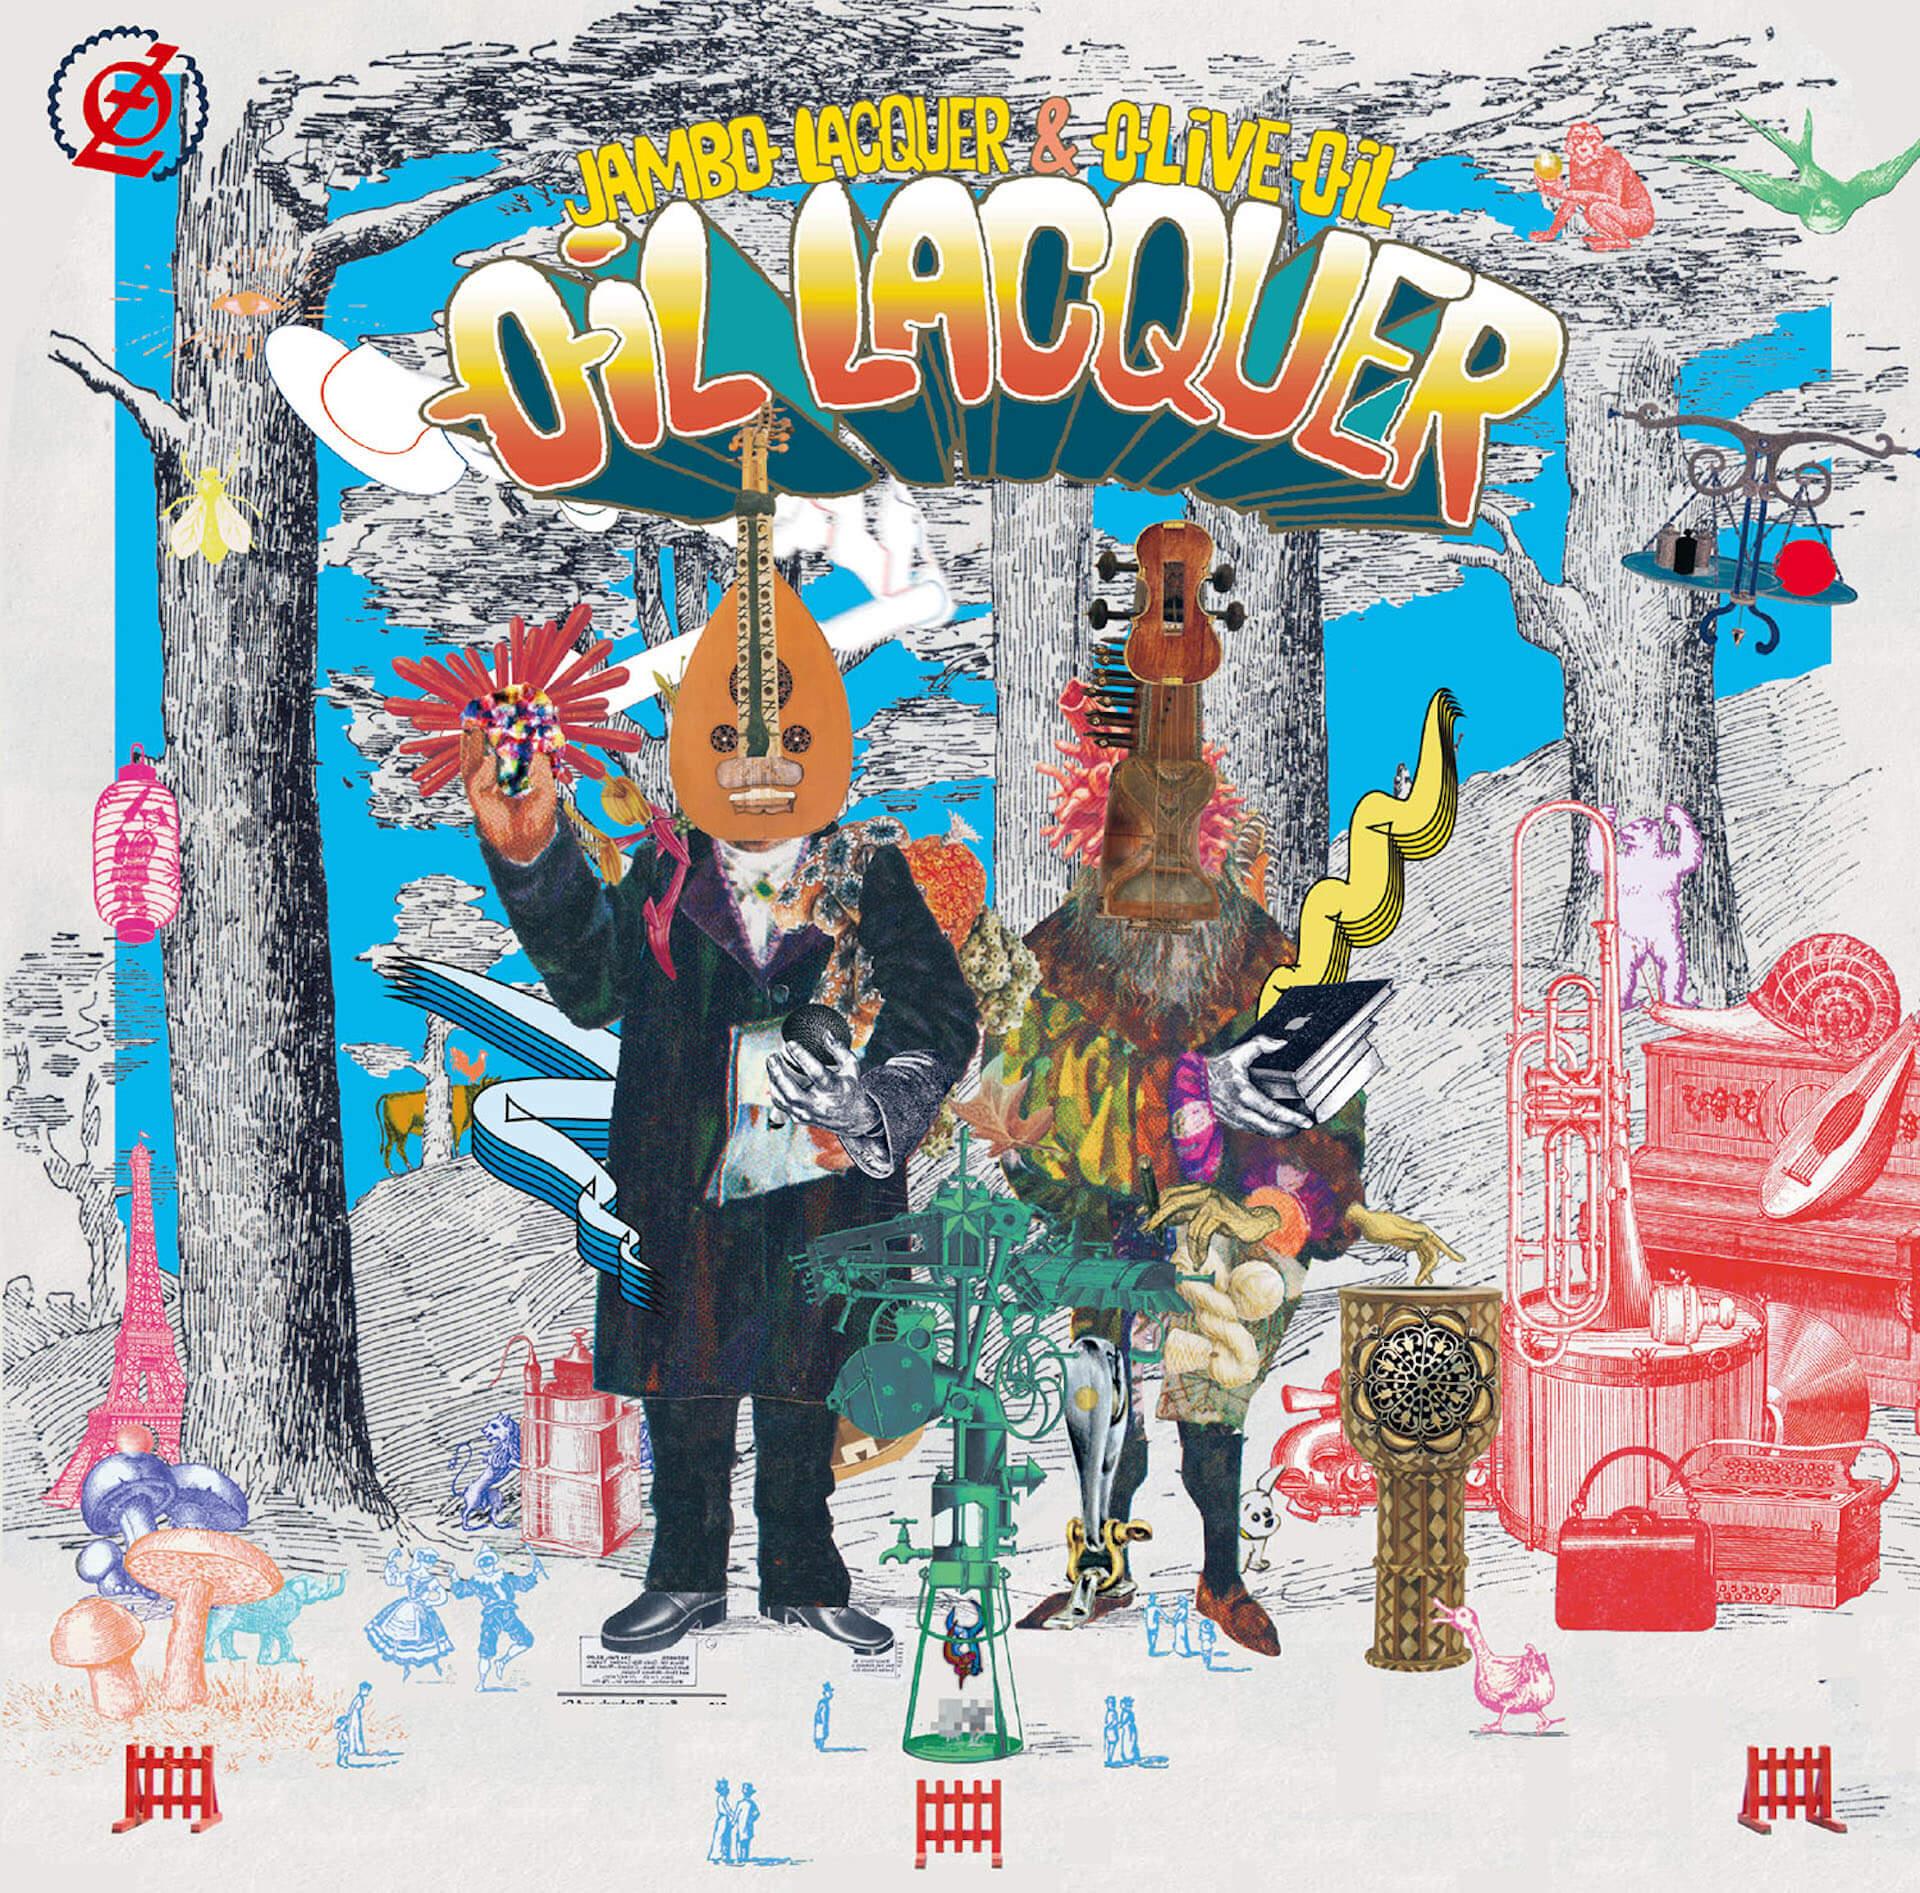 "Jambo Lacquer、Olive Oilとのジョイントアルバムや、ソロアルバムなどのストリーミングが解禁!""I KNOW BUT""MVも公開 music200422_jambolacquer_3"